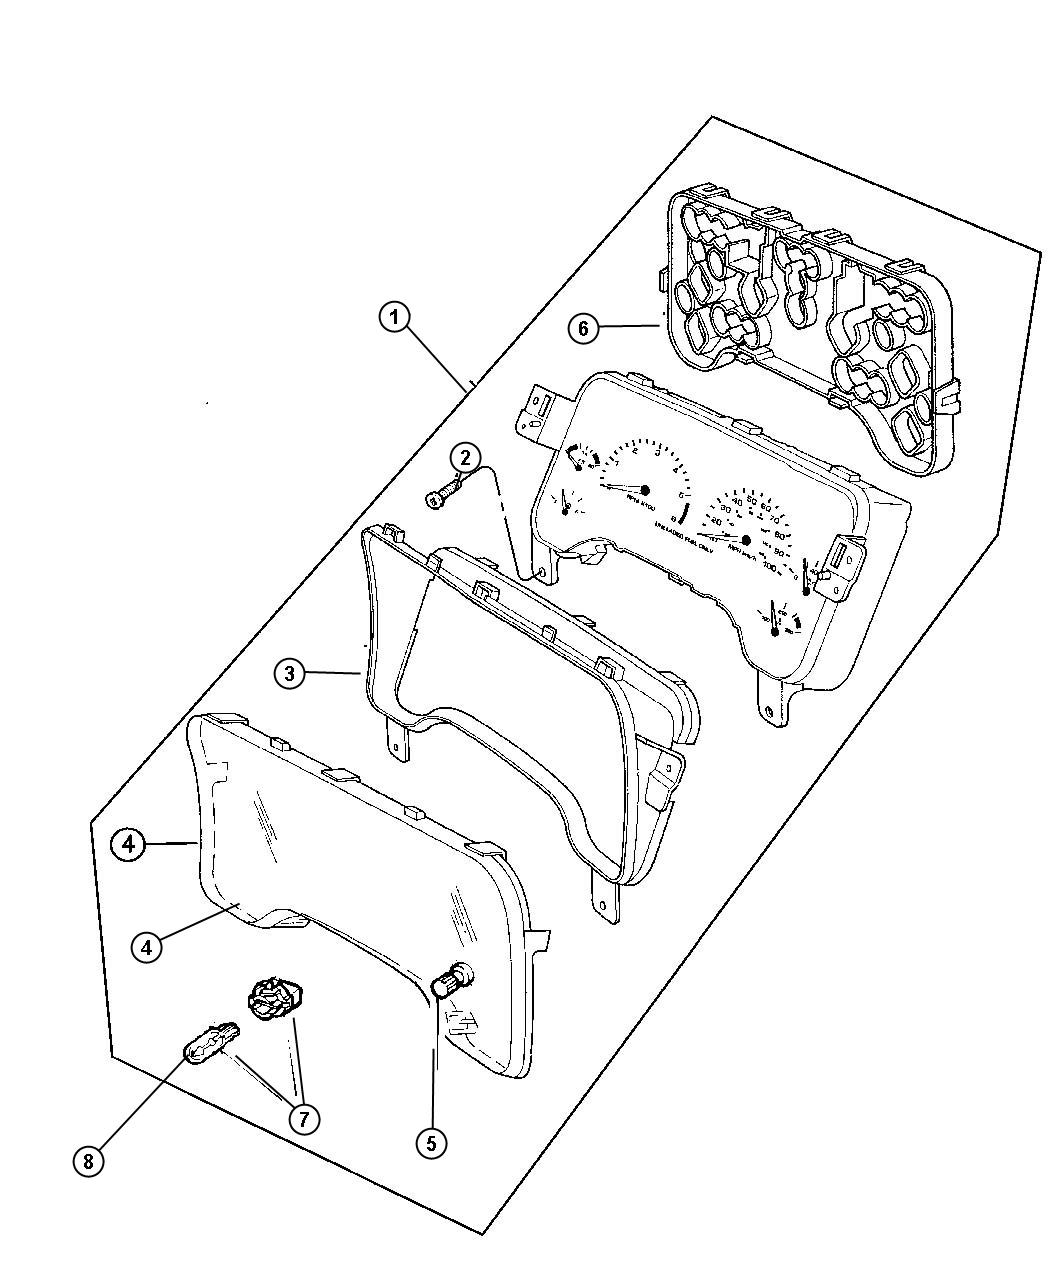 Jeep Wrangler Bulb. Pc74. Cluster, instrument cluster